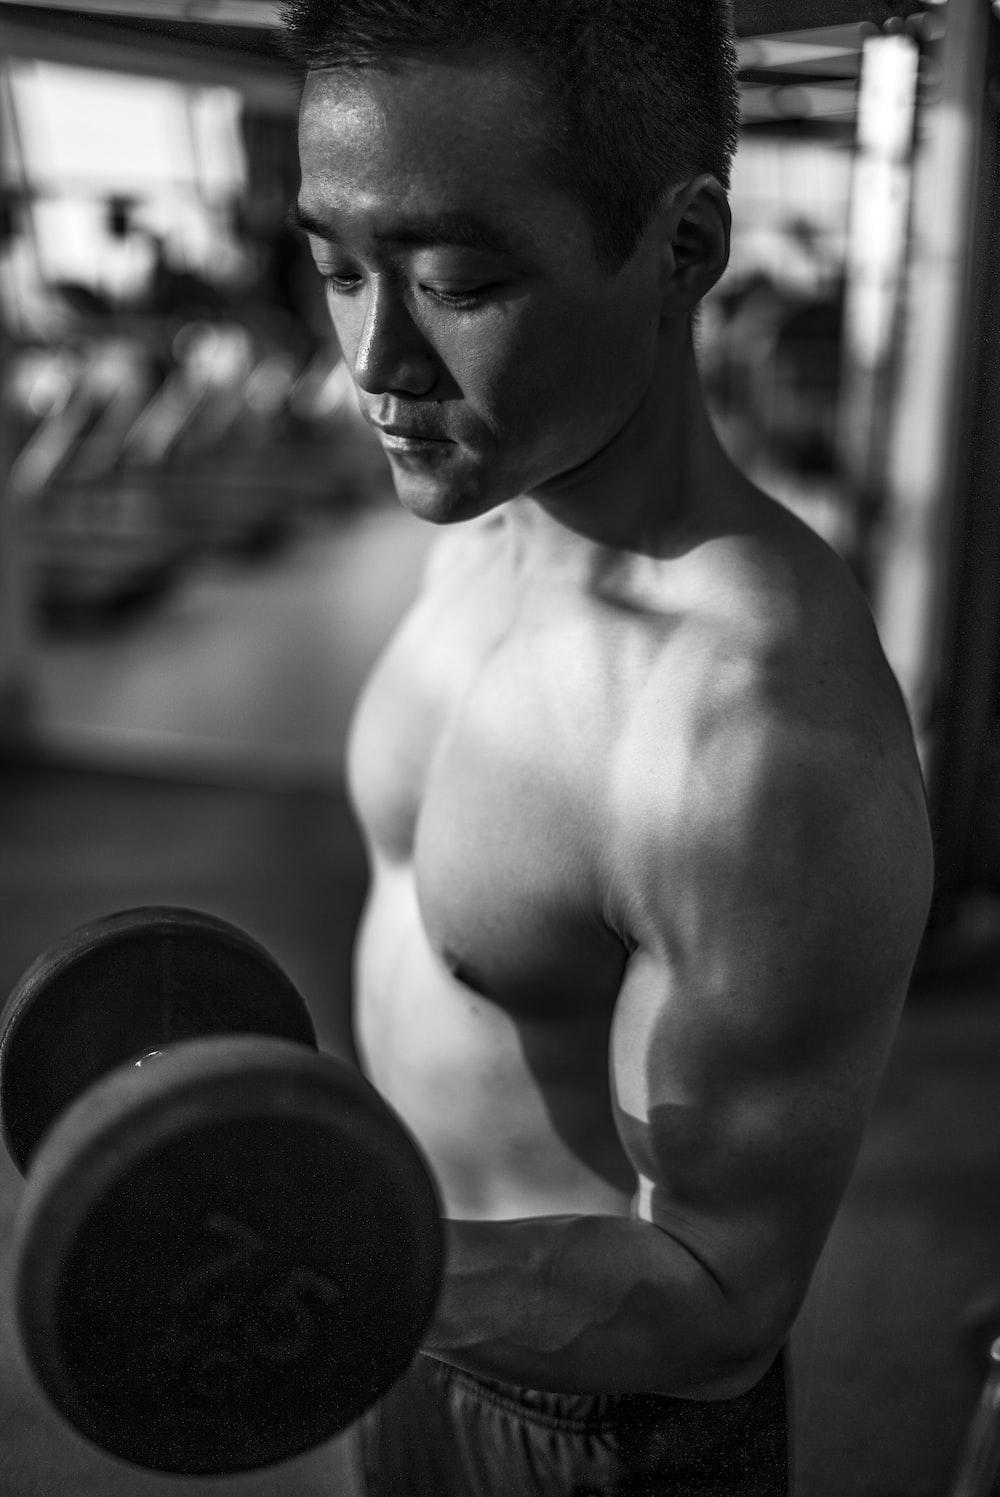 man lifting dumbbell inside gym